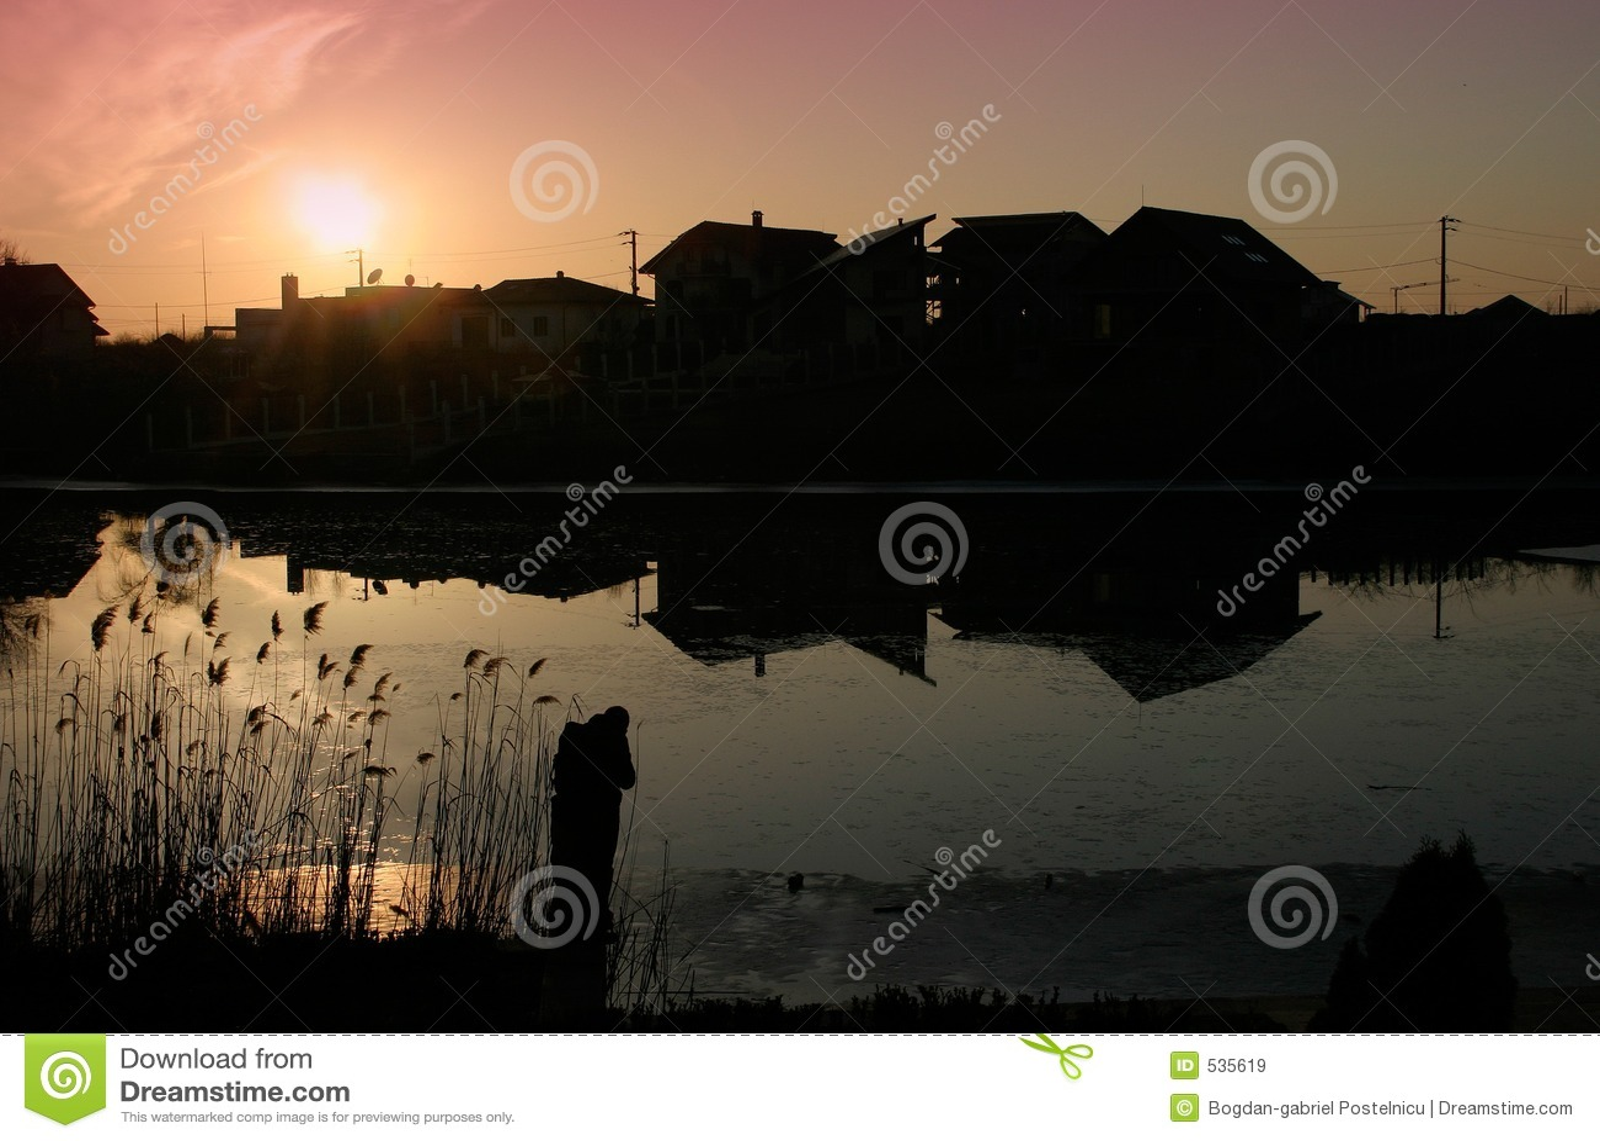 Download 房子 库存图片. 图片 包括有 晒裂, 日落, 邻里, 反映, 剪影, 捕鱼, 房子, beautifuler - 535619